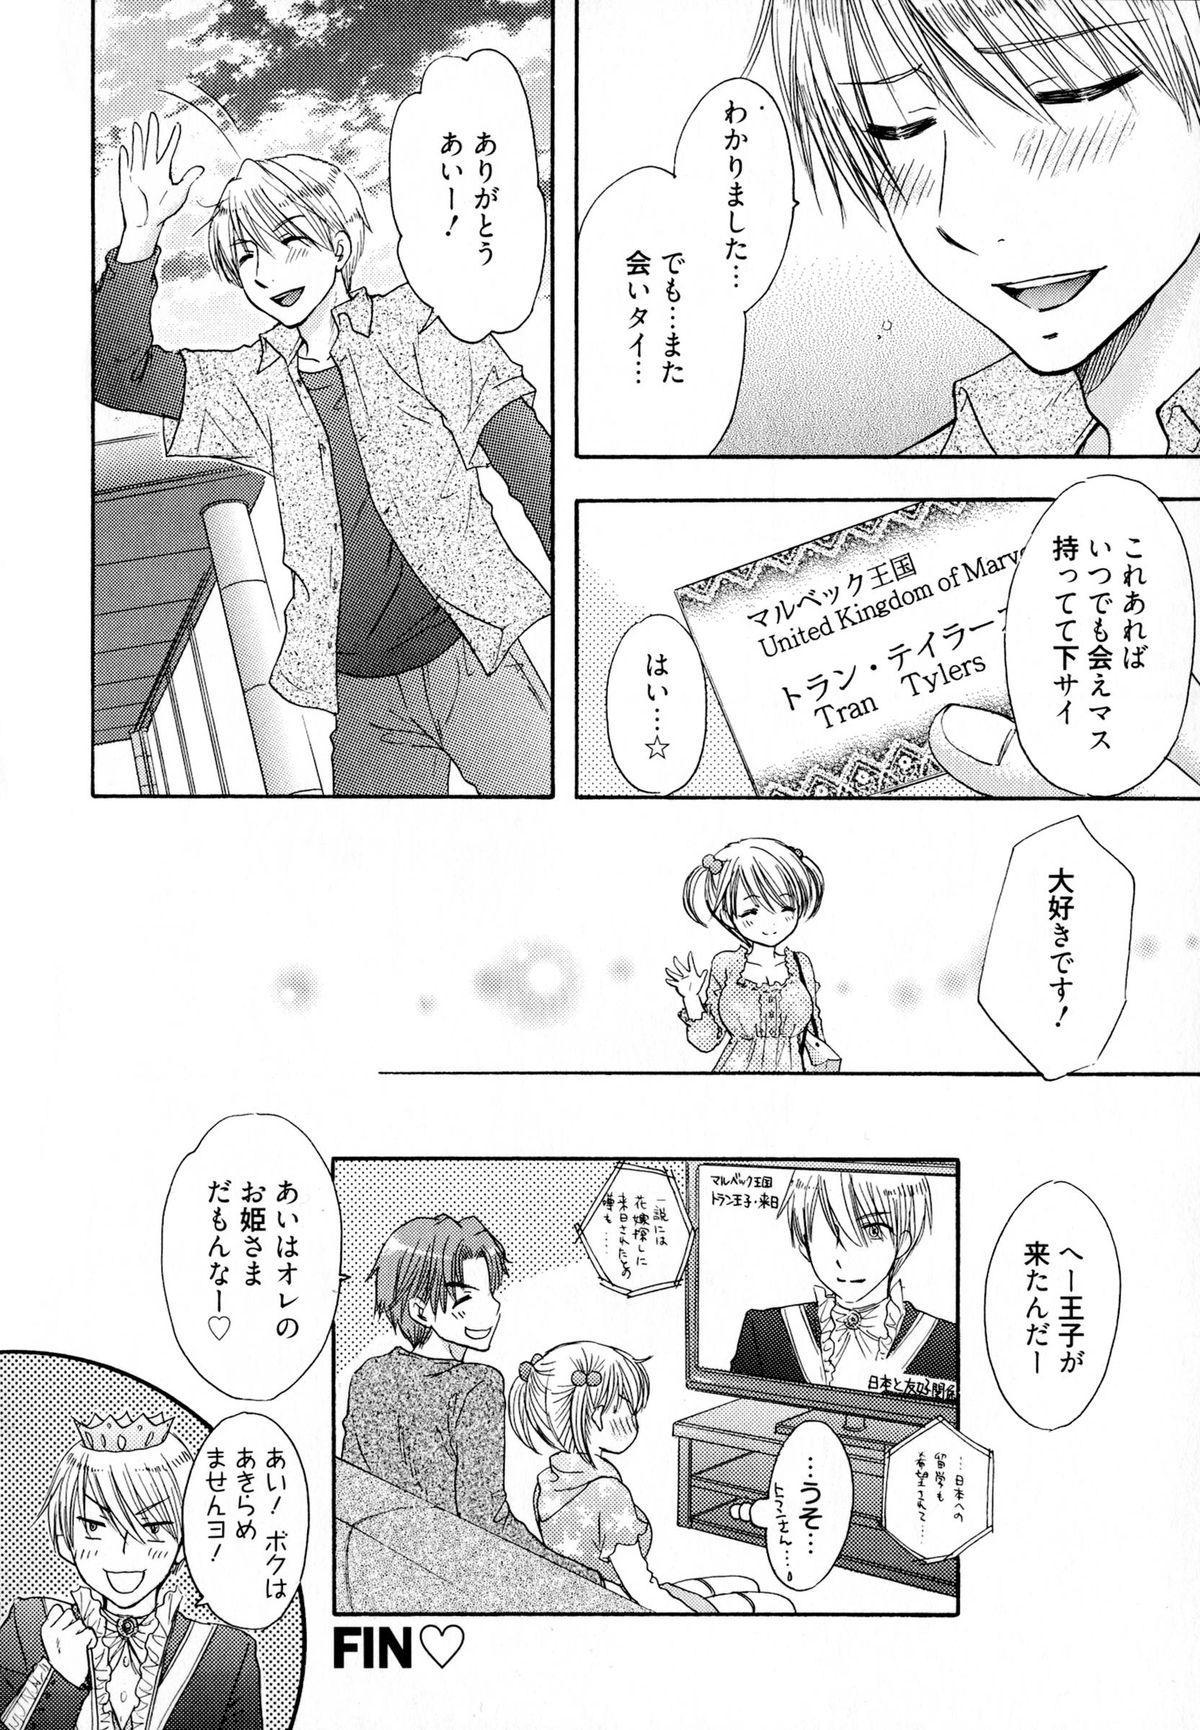 The Great Escape 4 Shokai Genteiban 167